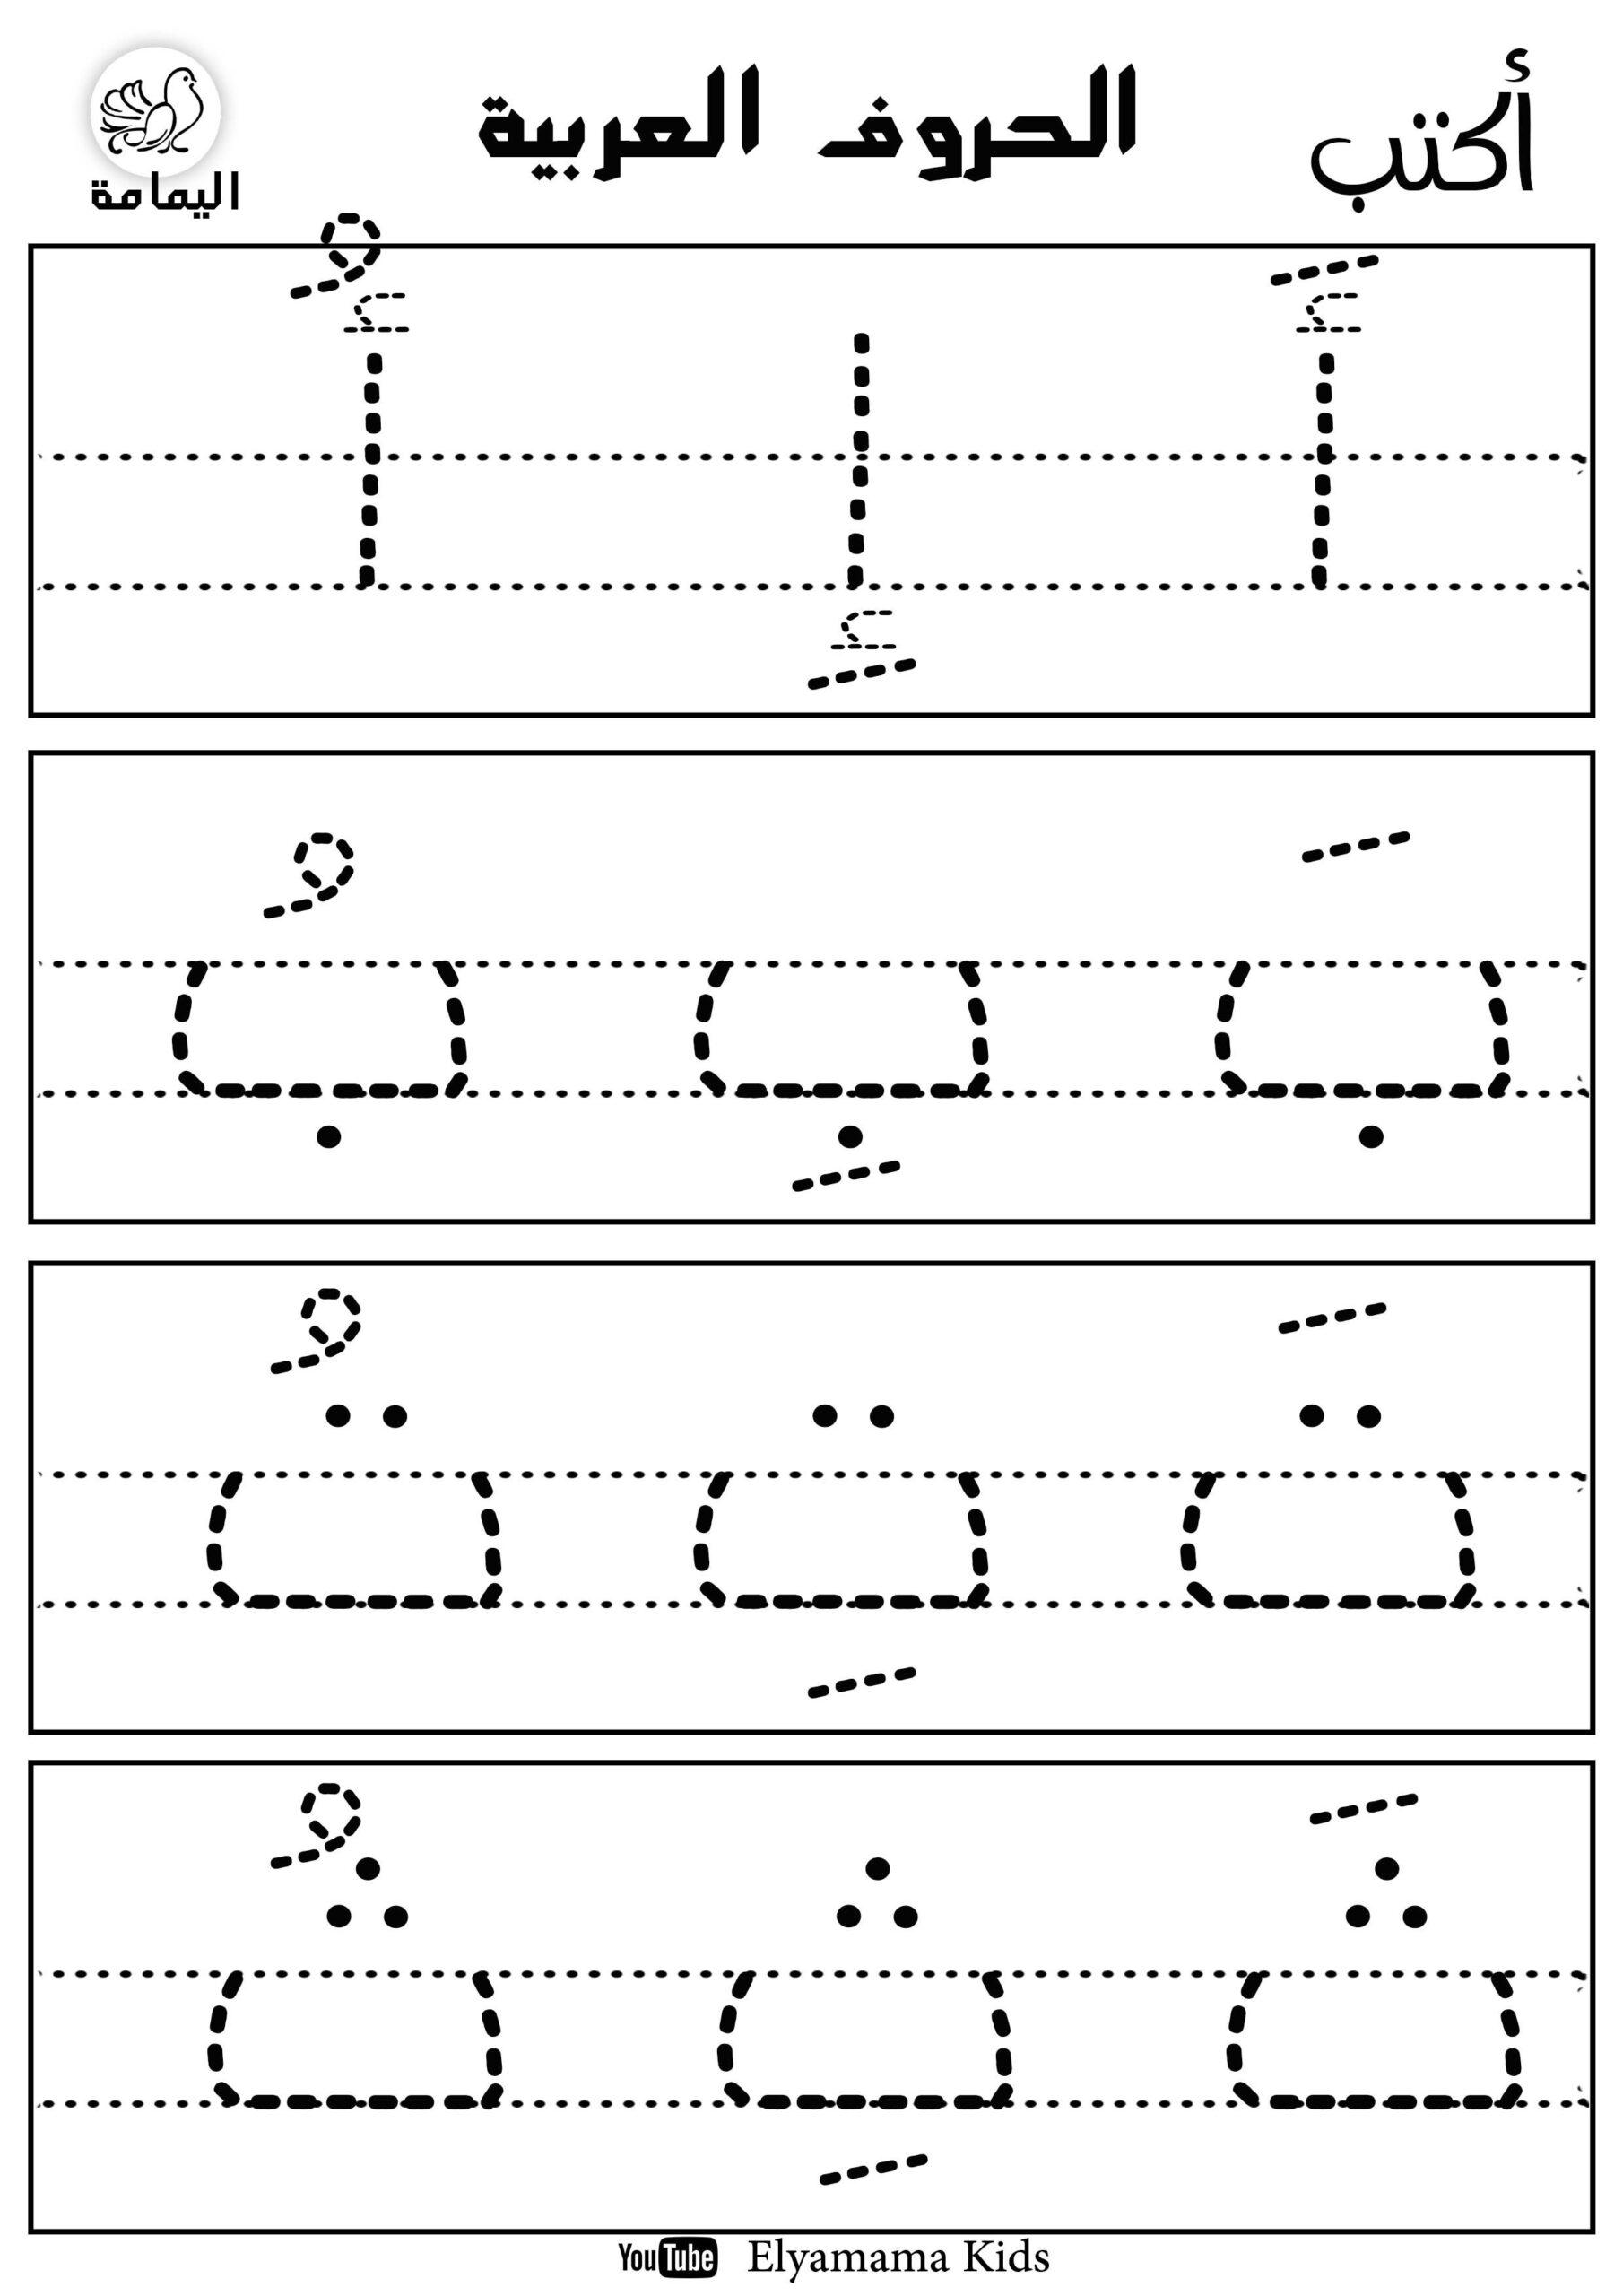 8687454E9B2A7E830E4408Bdf08179A8 (2480×3508) | Arabic within Arabic Alphabet Worksheets Grade 1 Pdf